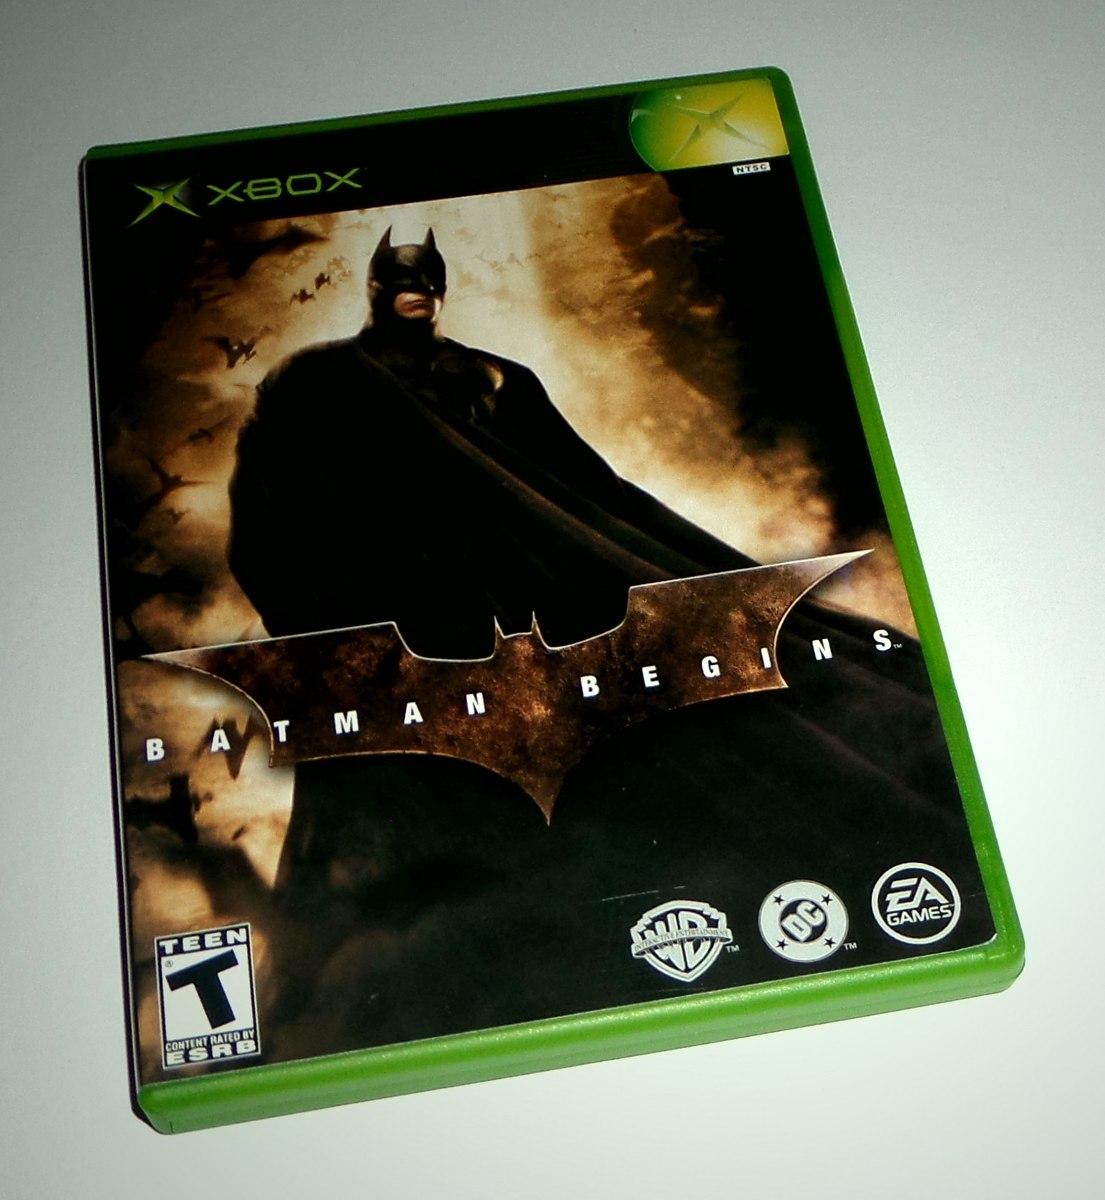 Batman Begins - Xbox